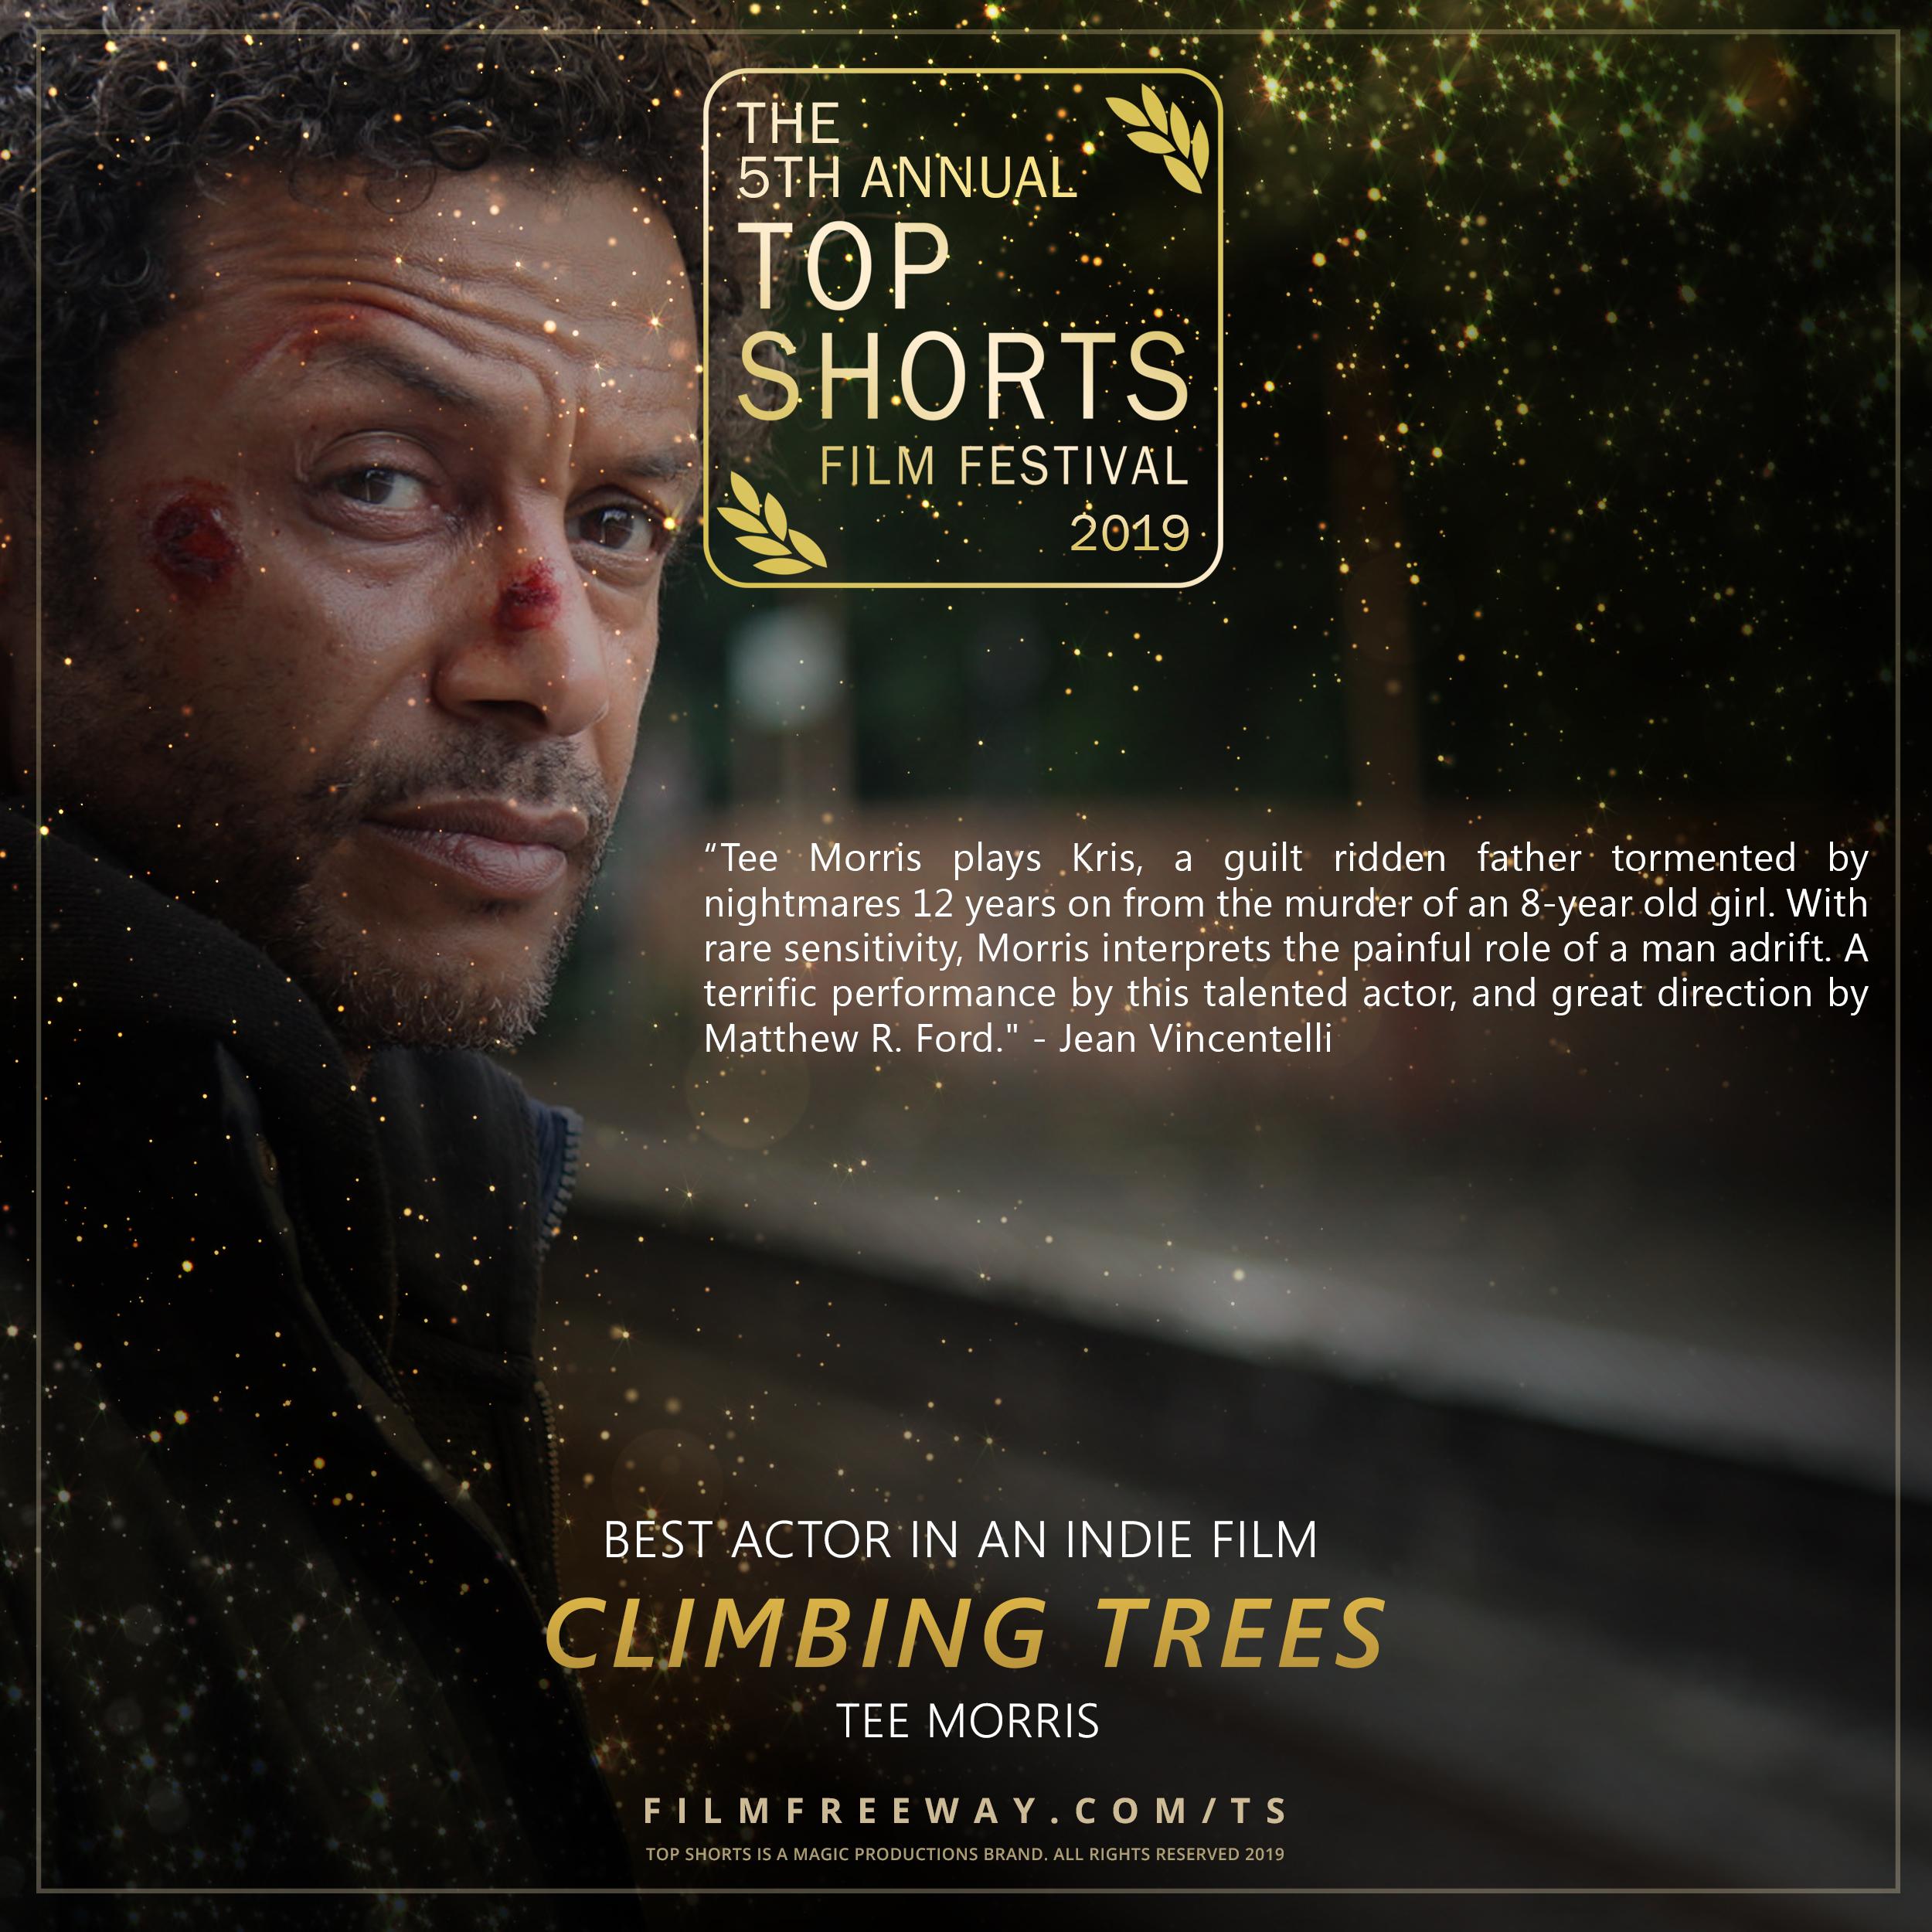 CLIMBING TREES design